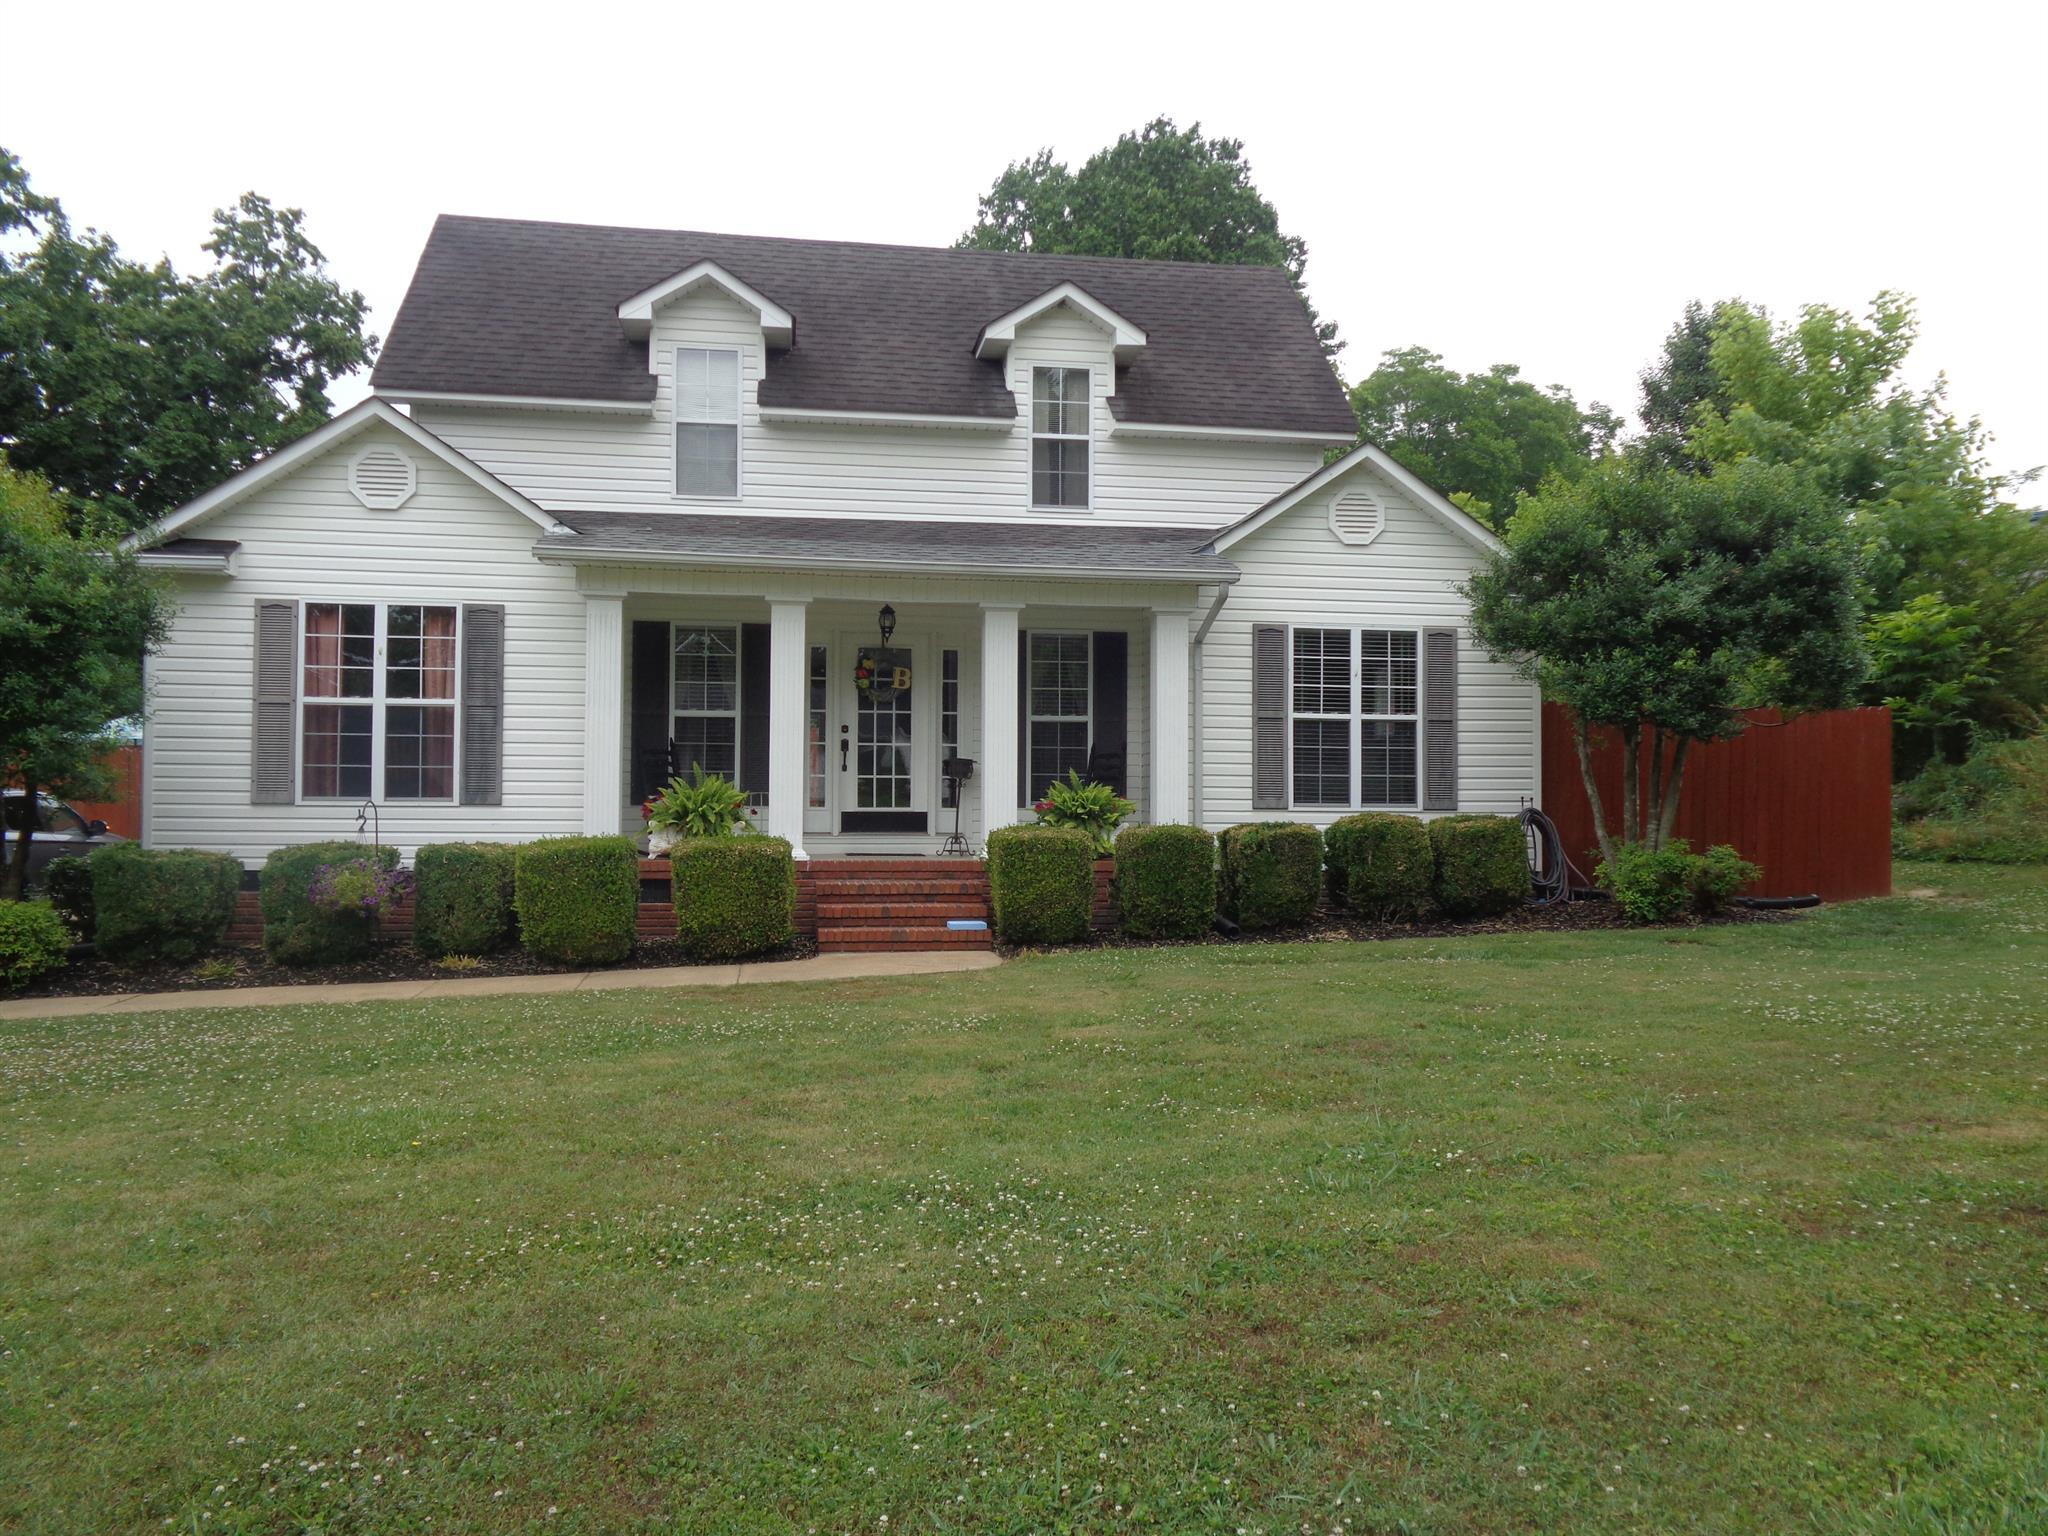 101 Springer Dr, Lawrenceburg, TN 38464 - Lawrenceburg, TN real estate listing